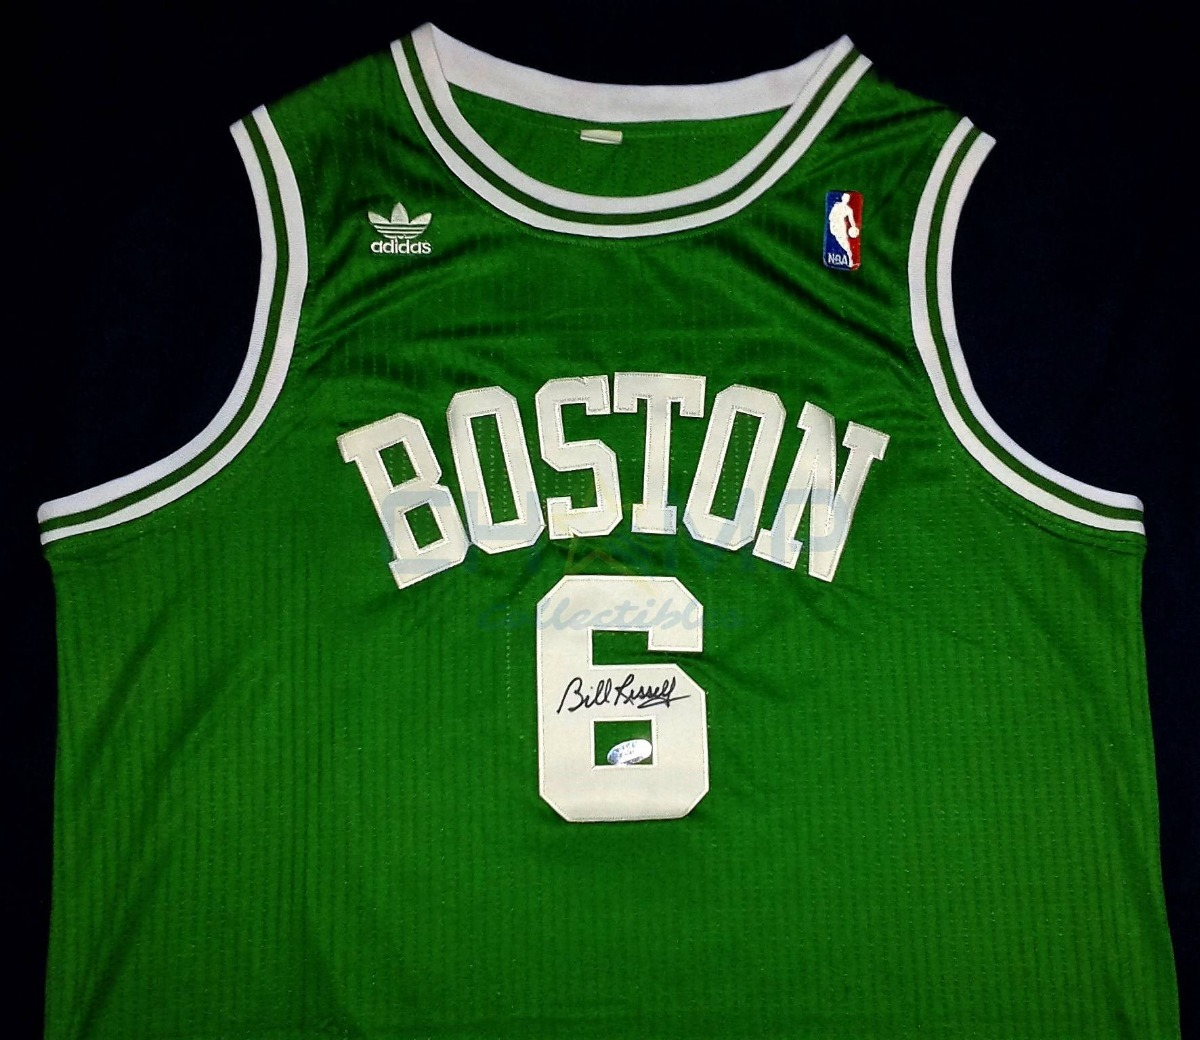 0dd21fbdfbf jersey firmado bill russell boston celtics autografo nba. Cargando zoom.